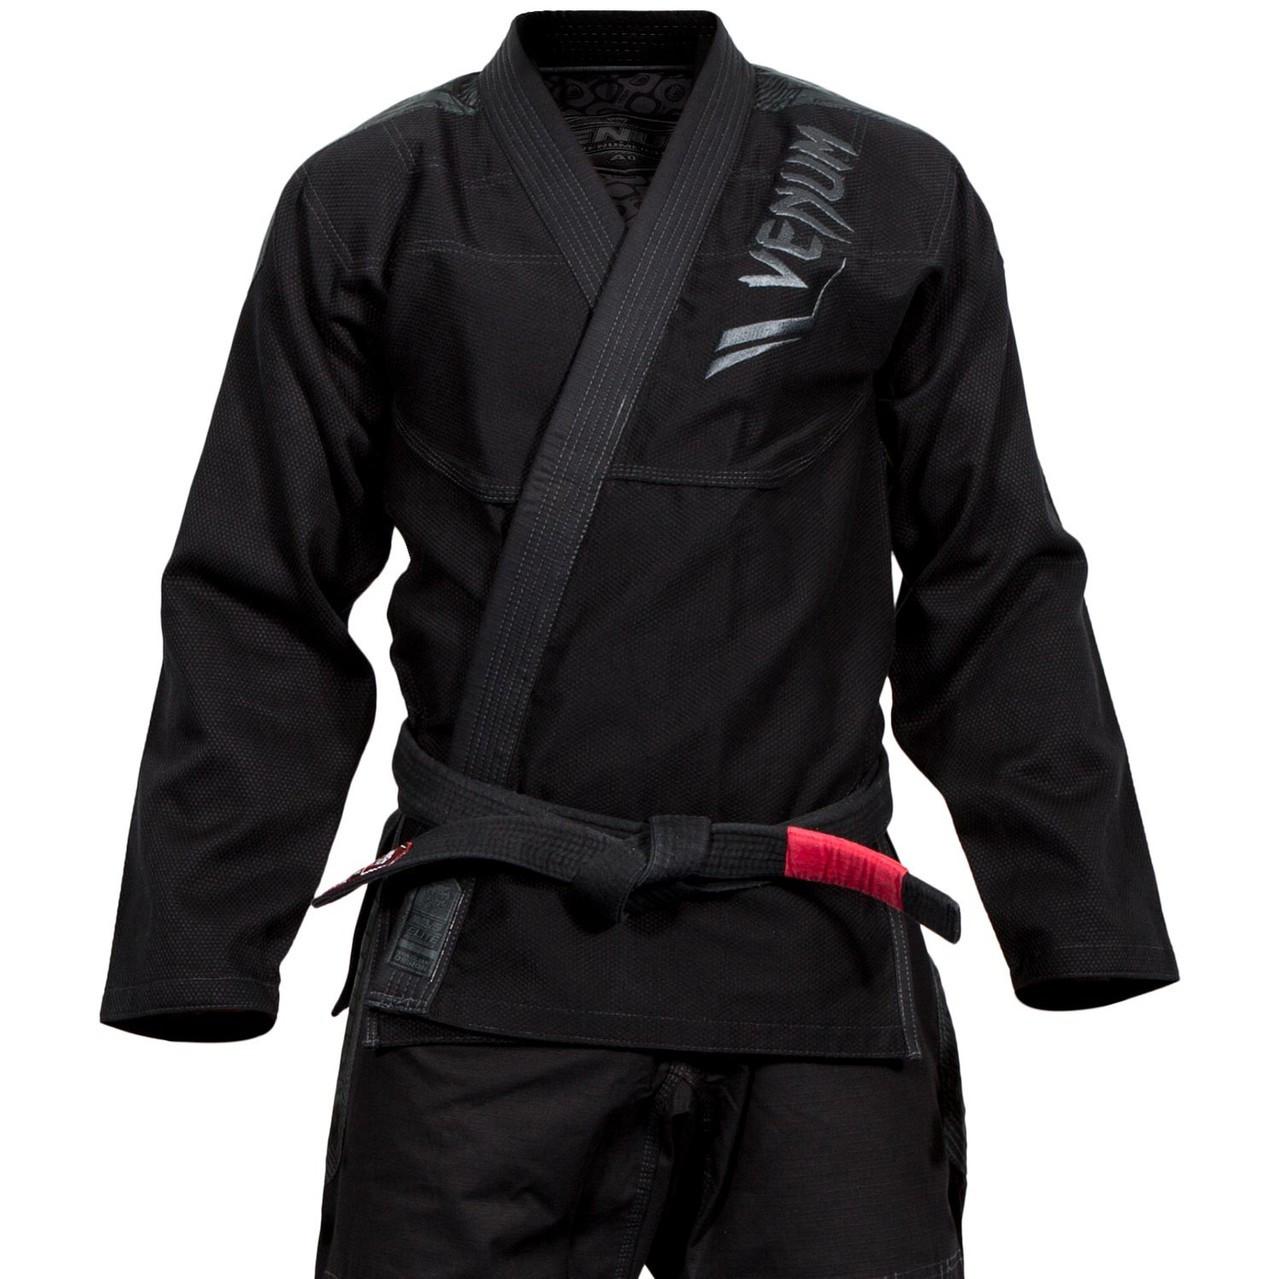 Venum Elite Bjj Gi Black On Black The Jiu Jitsu Shop